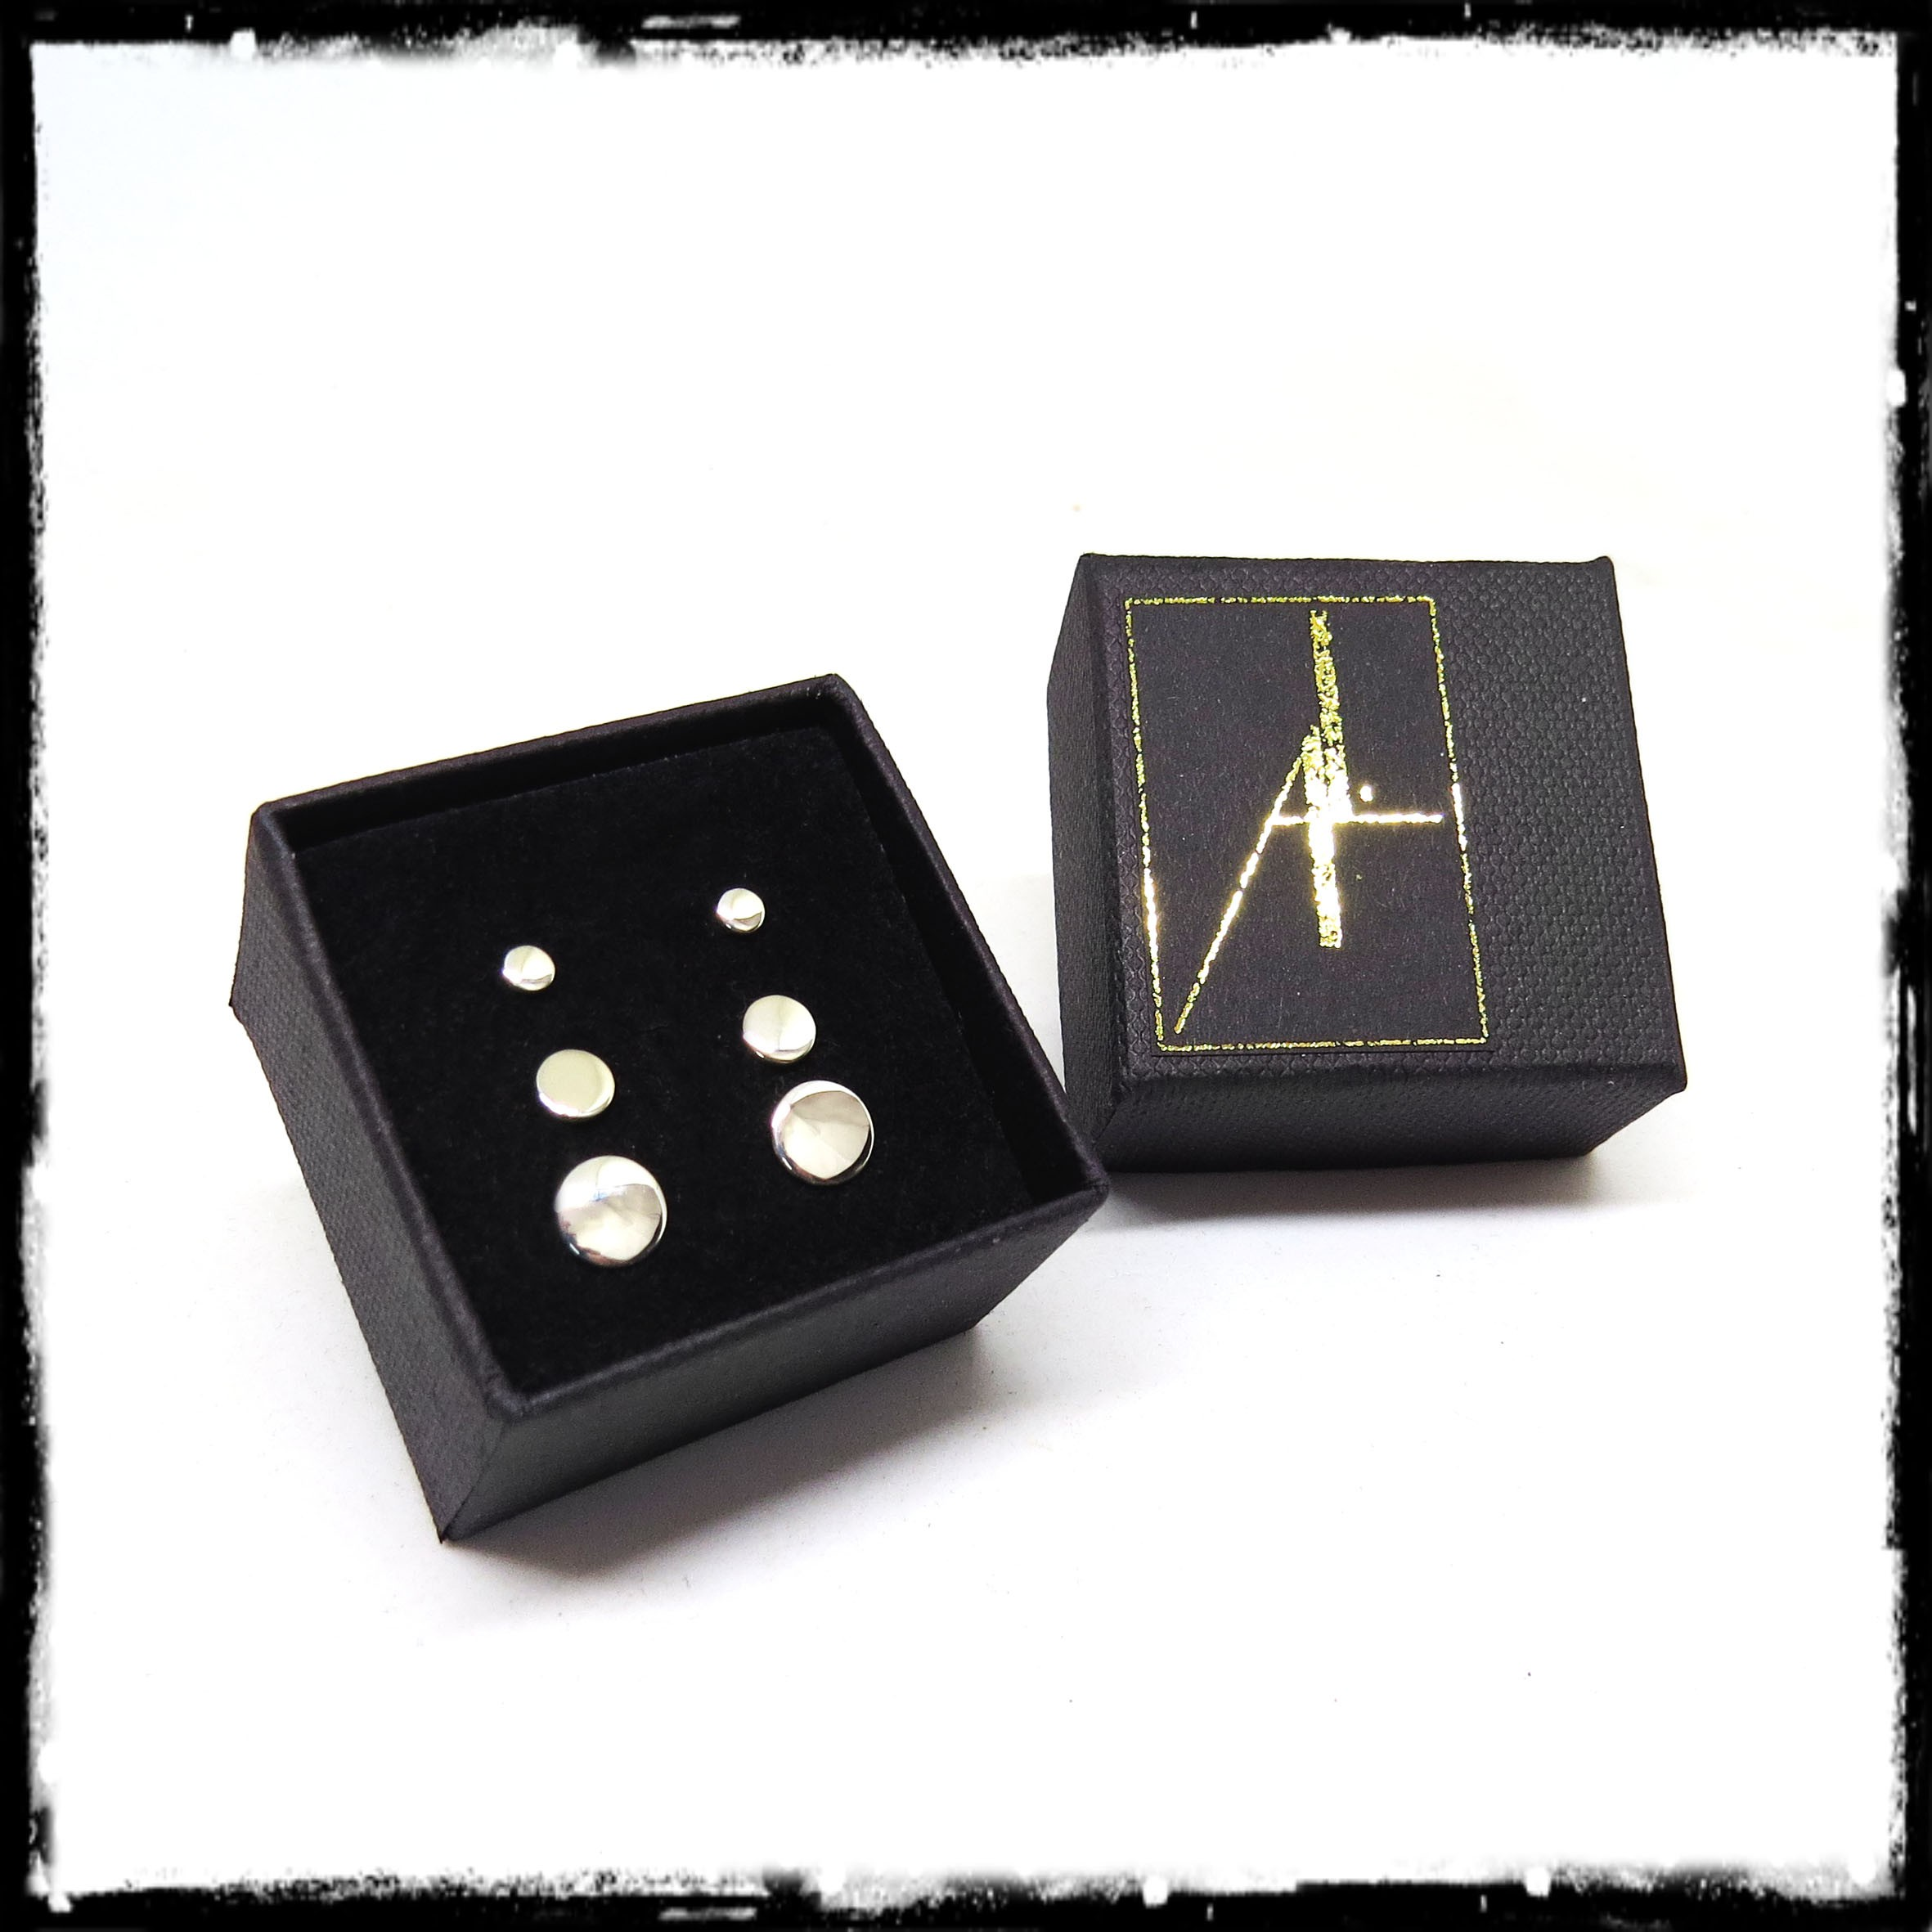 Handgefertigt sterling silber ring  925  R001771 EMPRESS